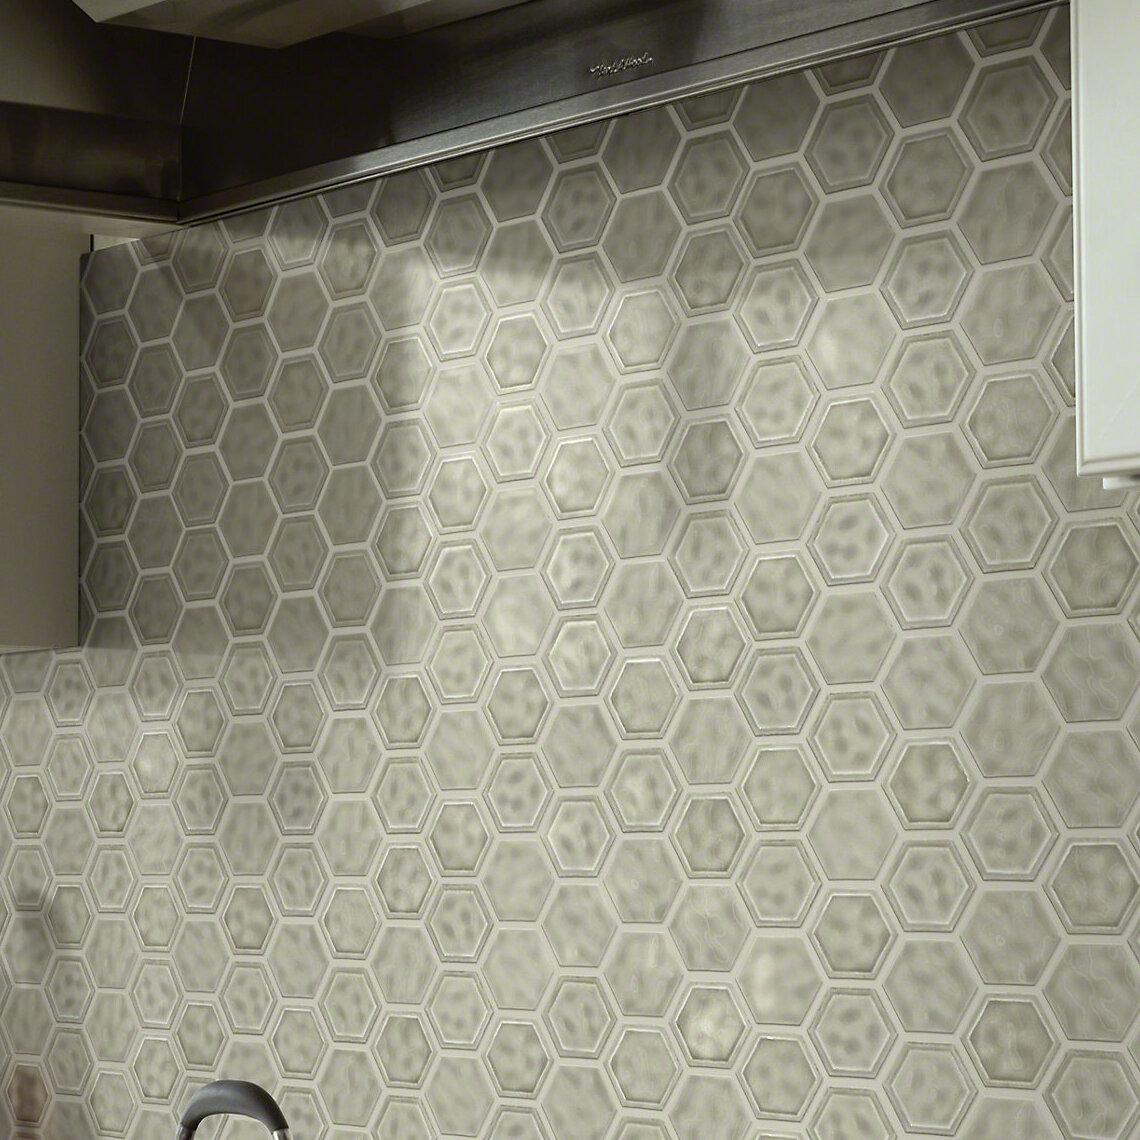 Shaw Floors Victoria Hexagon 0.64\